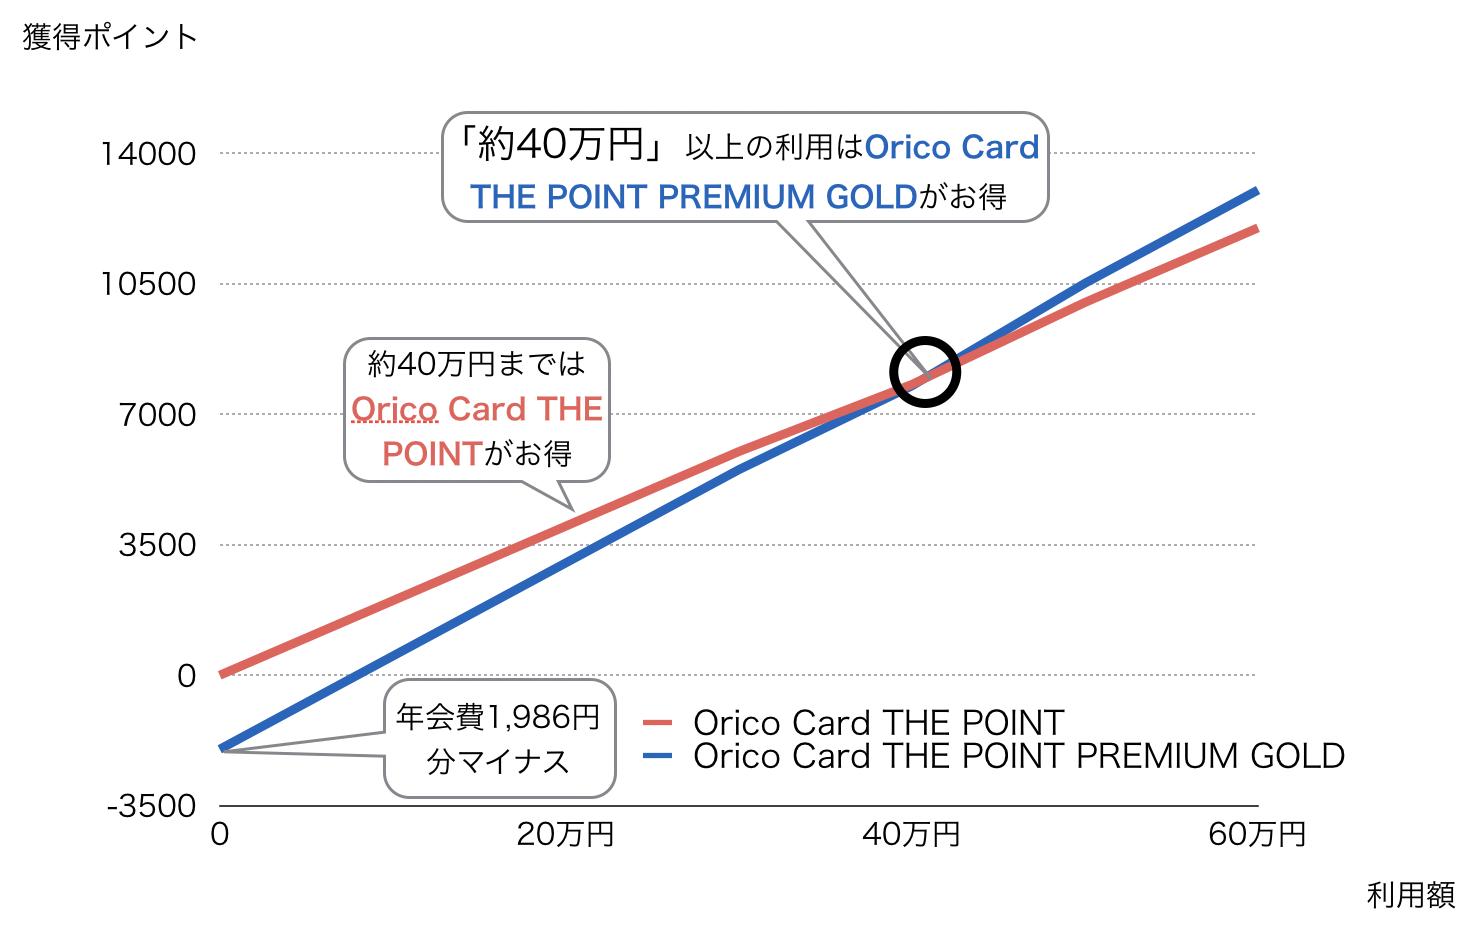 Orico Card THE POINT PREMIUM GOLDの損益分岐点(消費税10%)